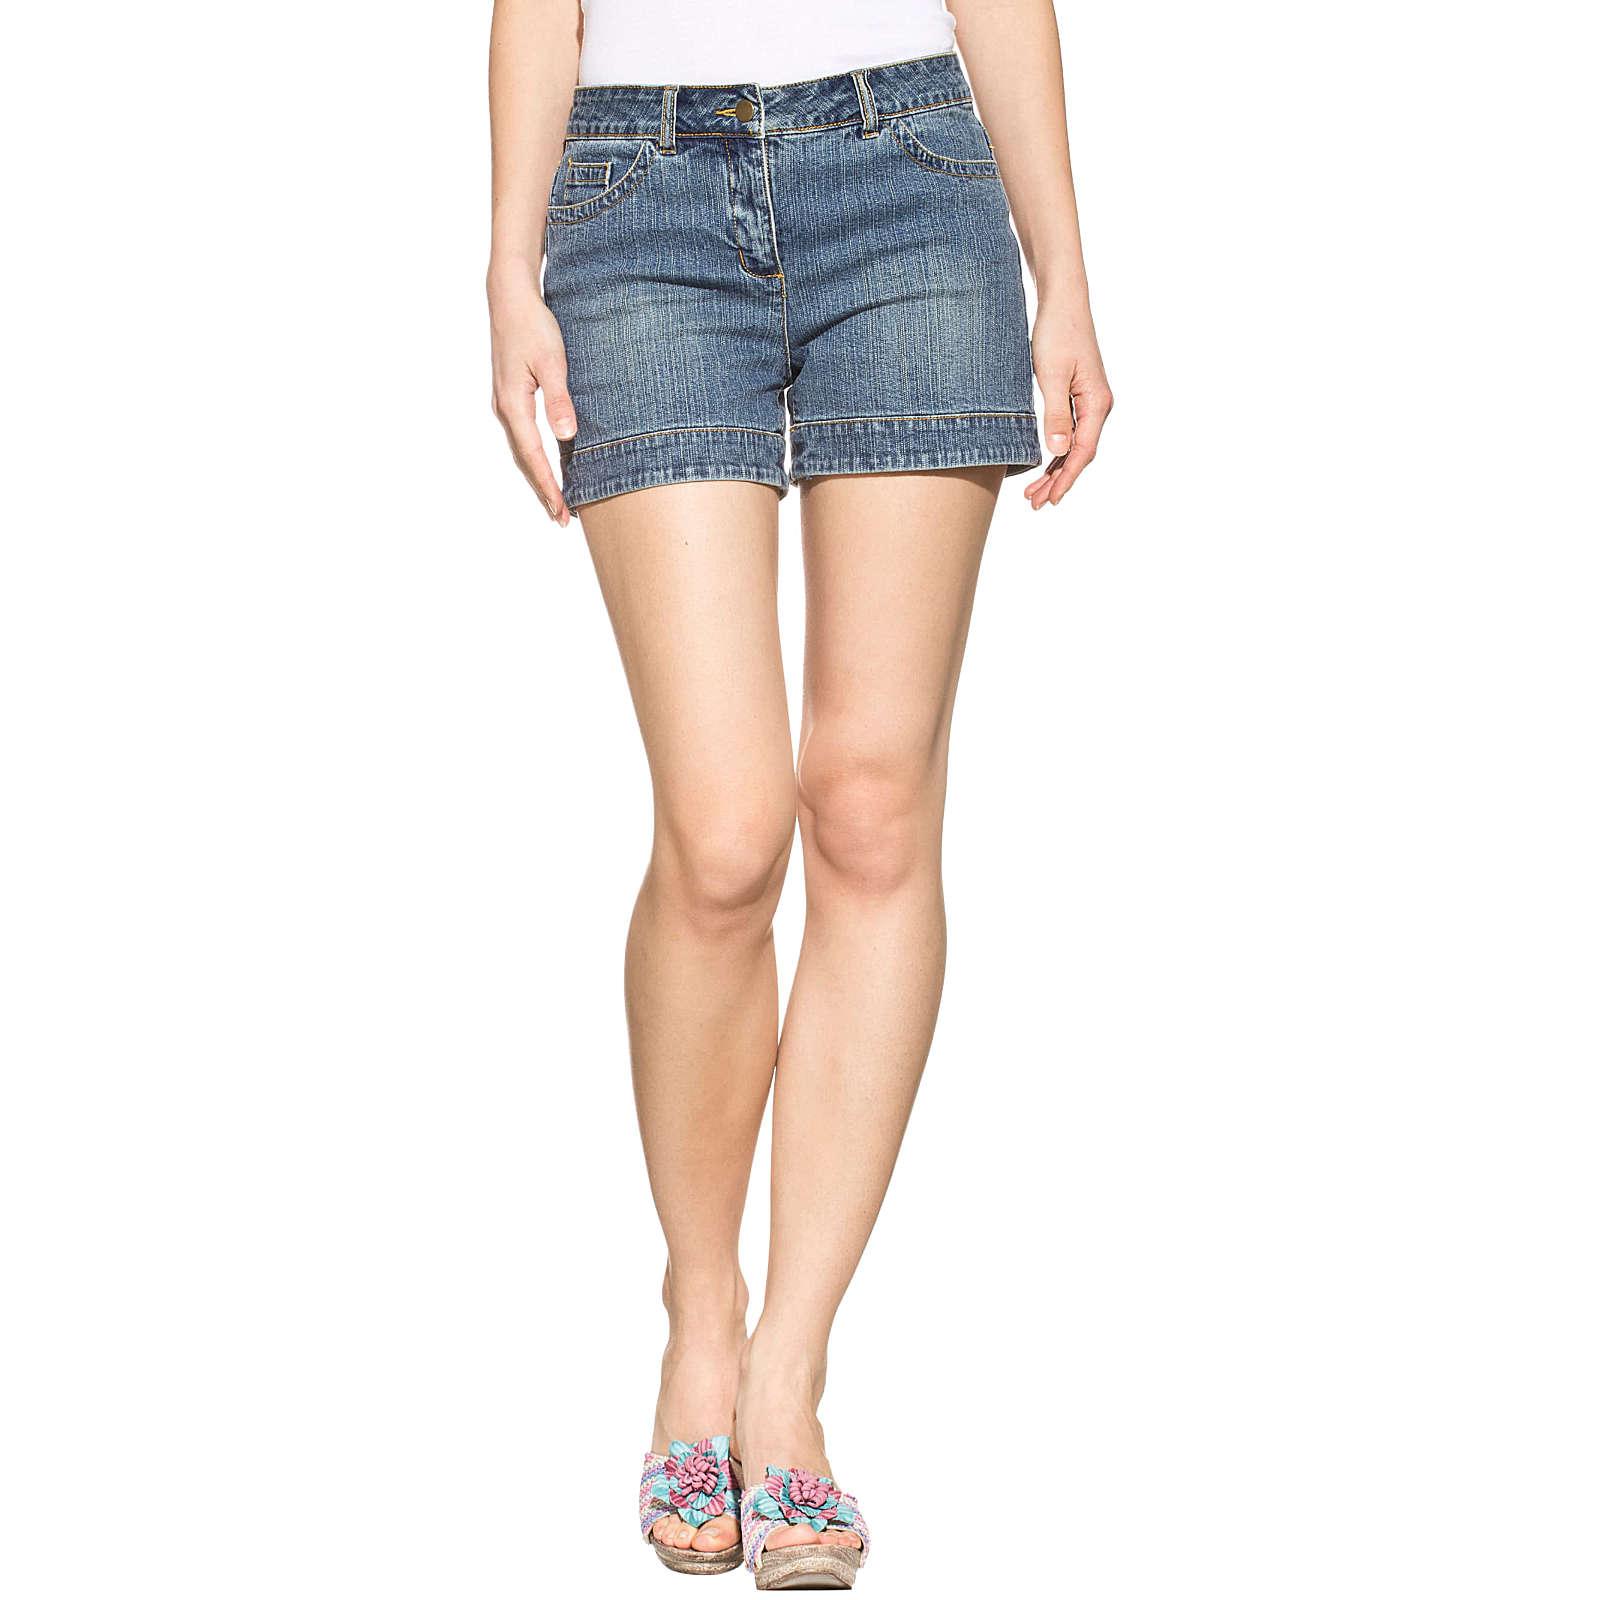 Alba Moda Jeans-Shorts Damen Gr. 38